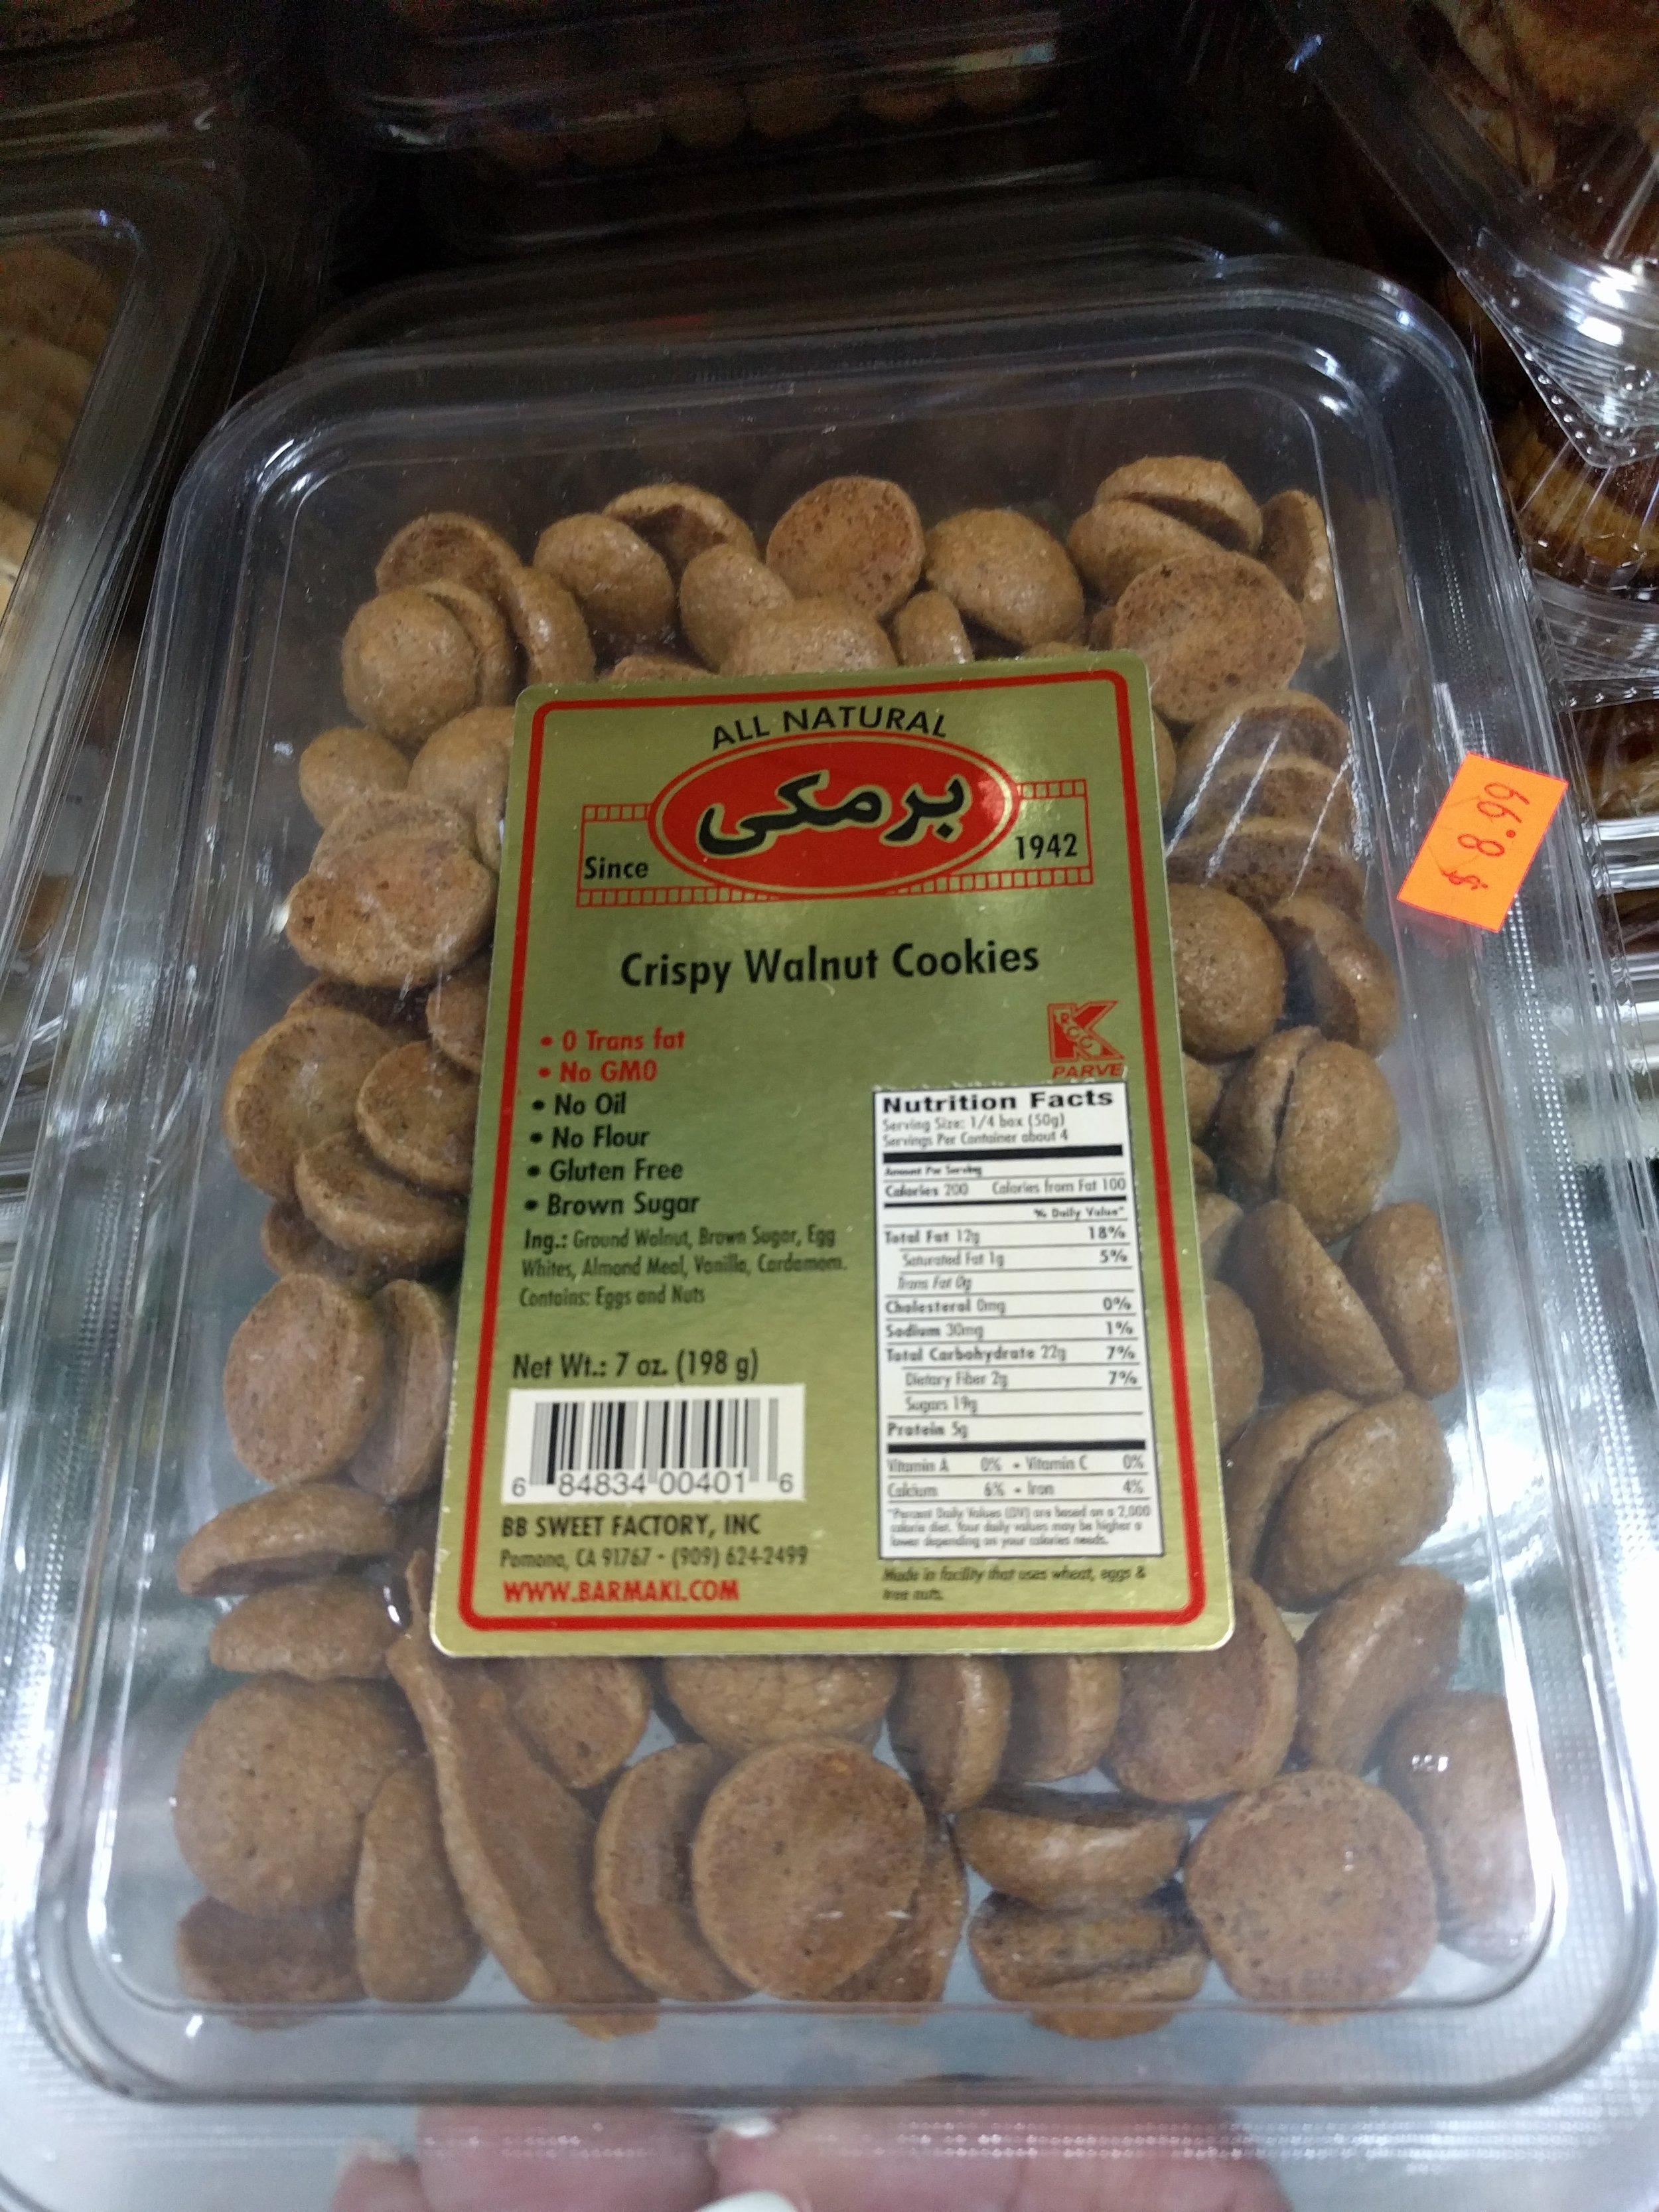 crispy-walnut-cookies-Pak-Halal-International-Foods-12259-W-87th-St-Pkwy-Lenexa-KS-66215.jpg